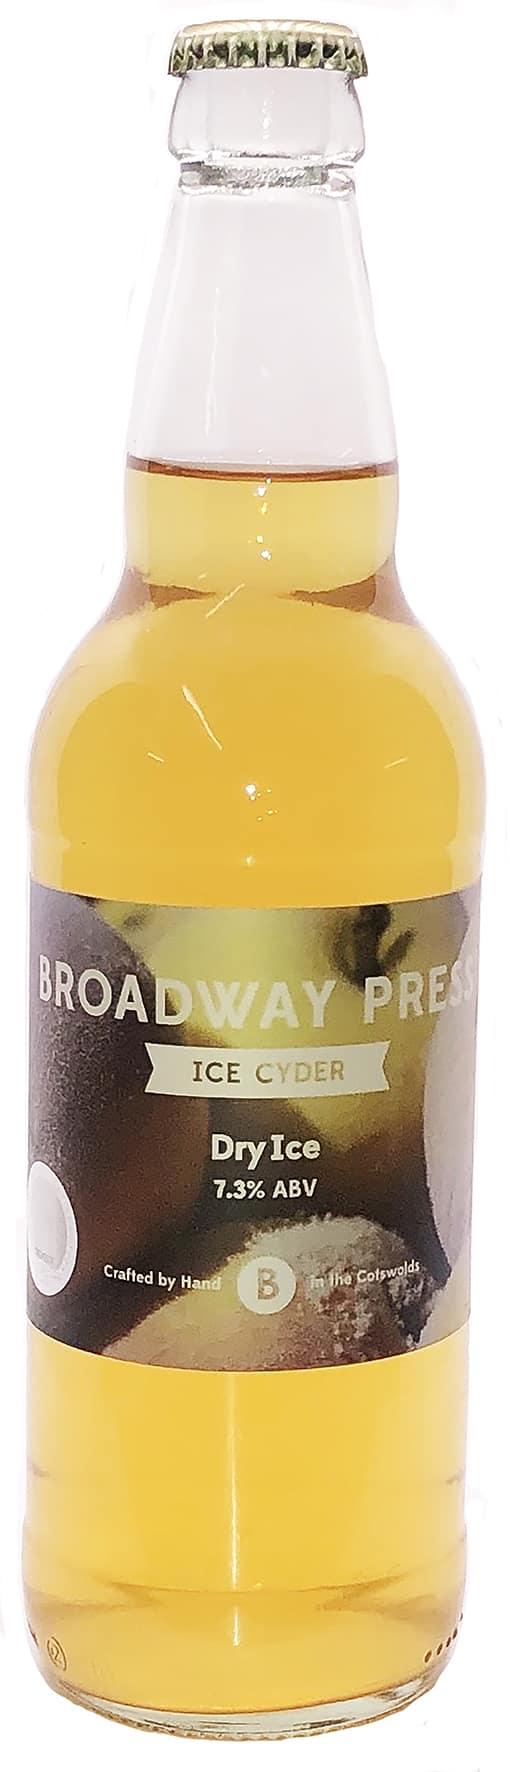 Broadway Press – Ice Cyder® Dry Ice